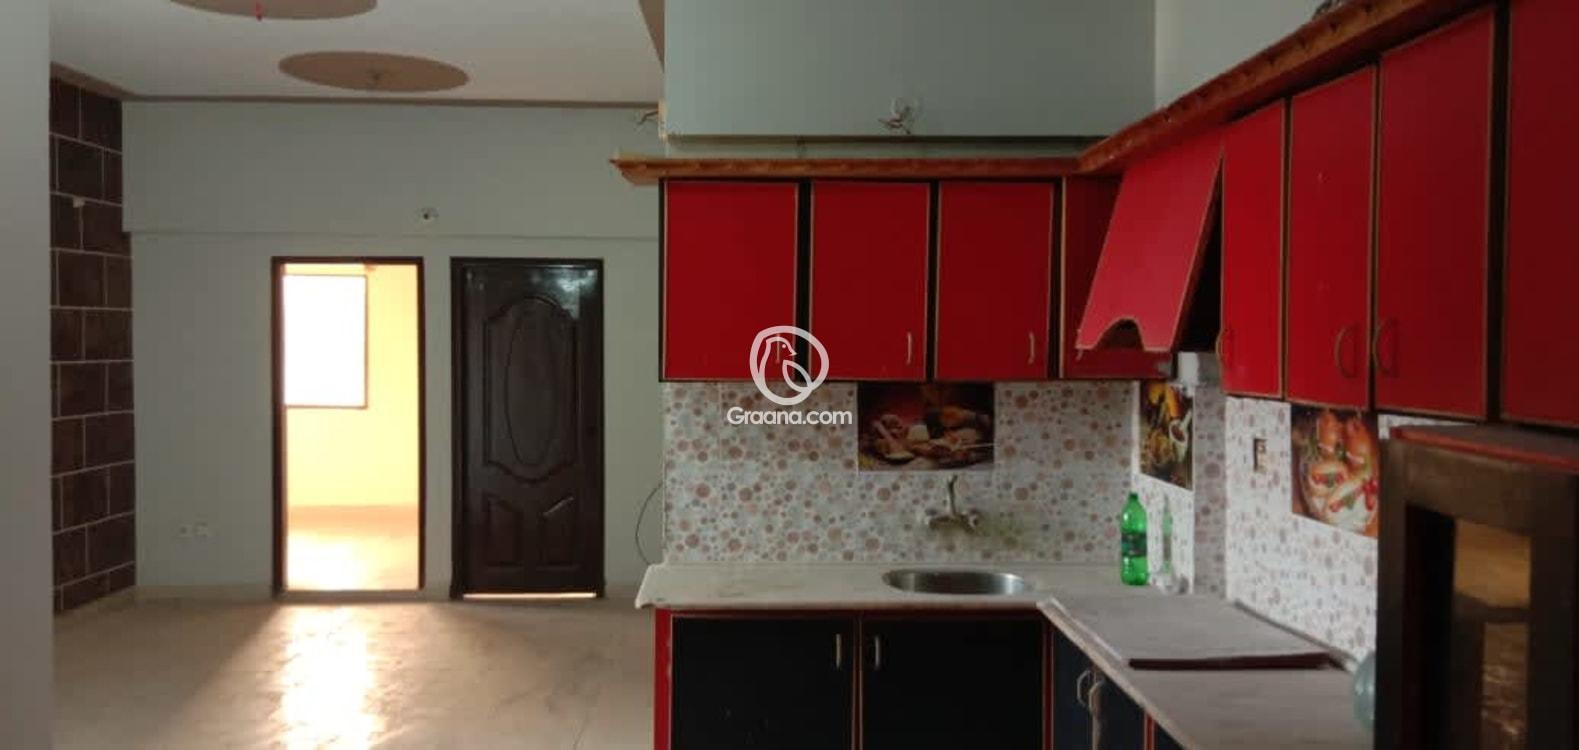 4th Floor  800 Sqft  Apartment for Sale   Graana.com